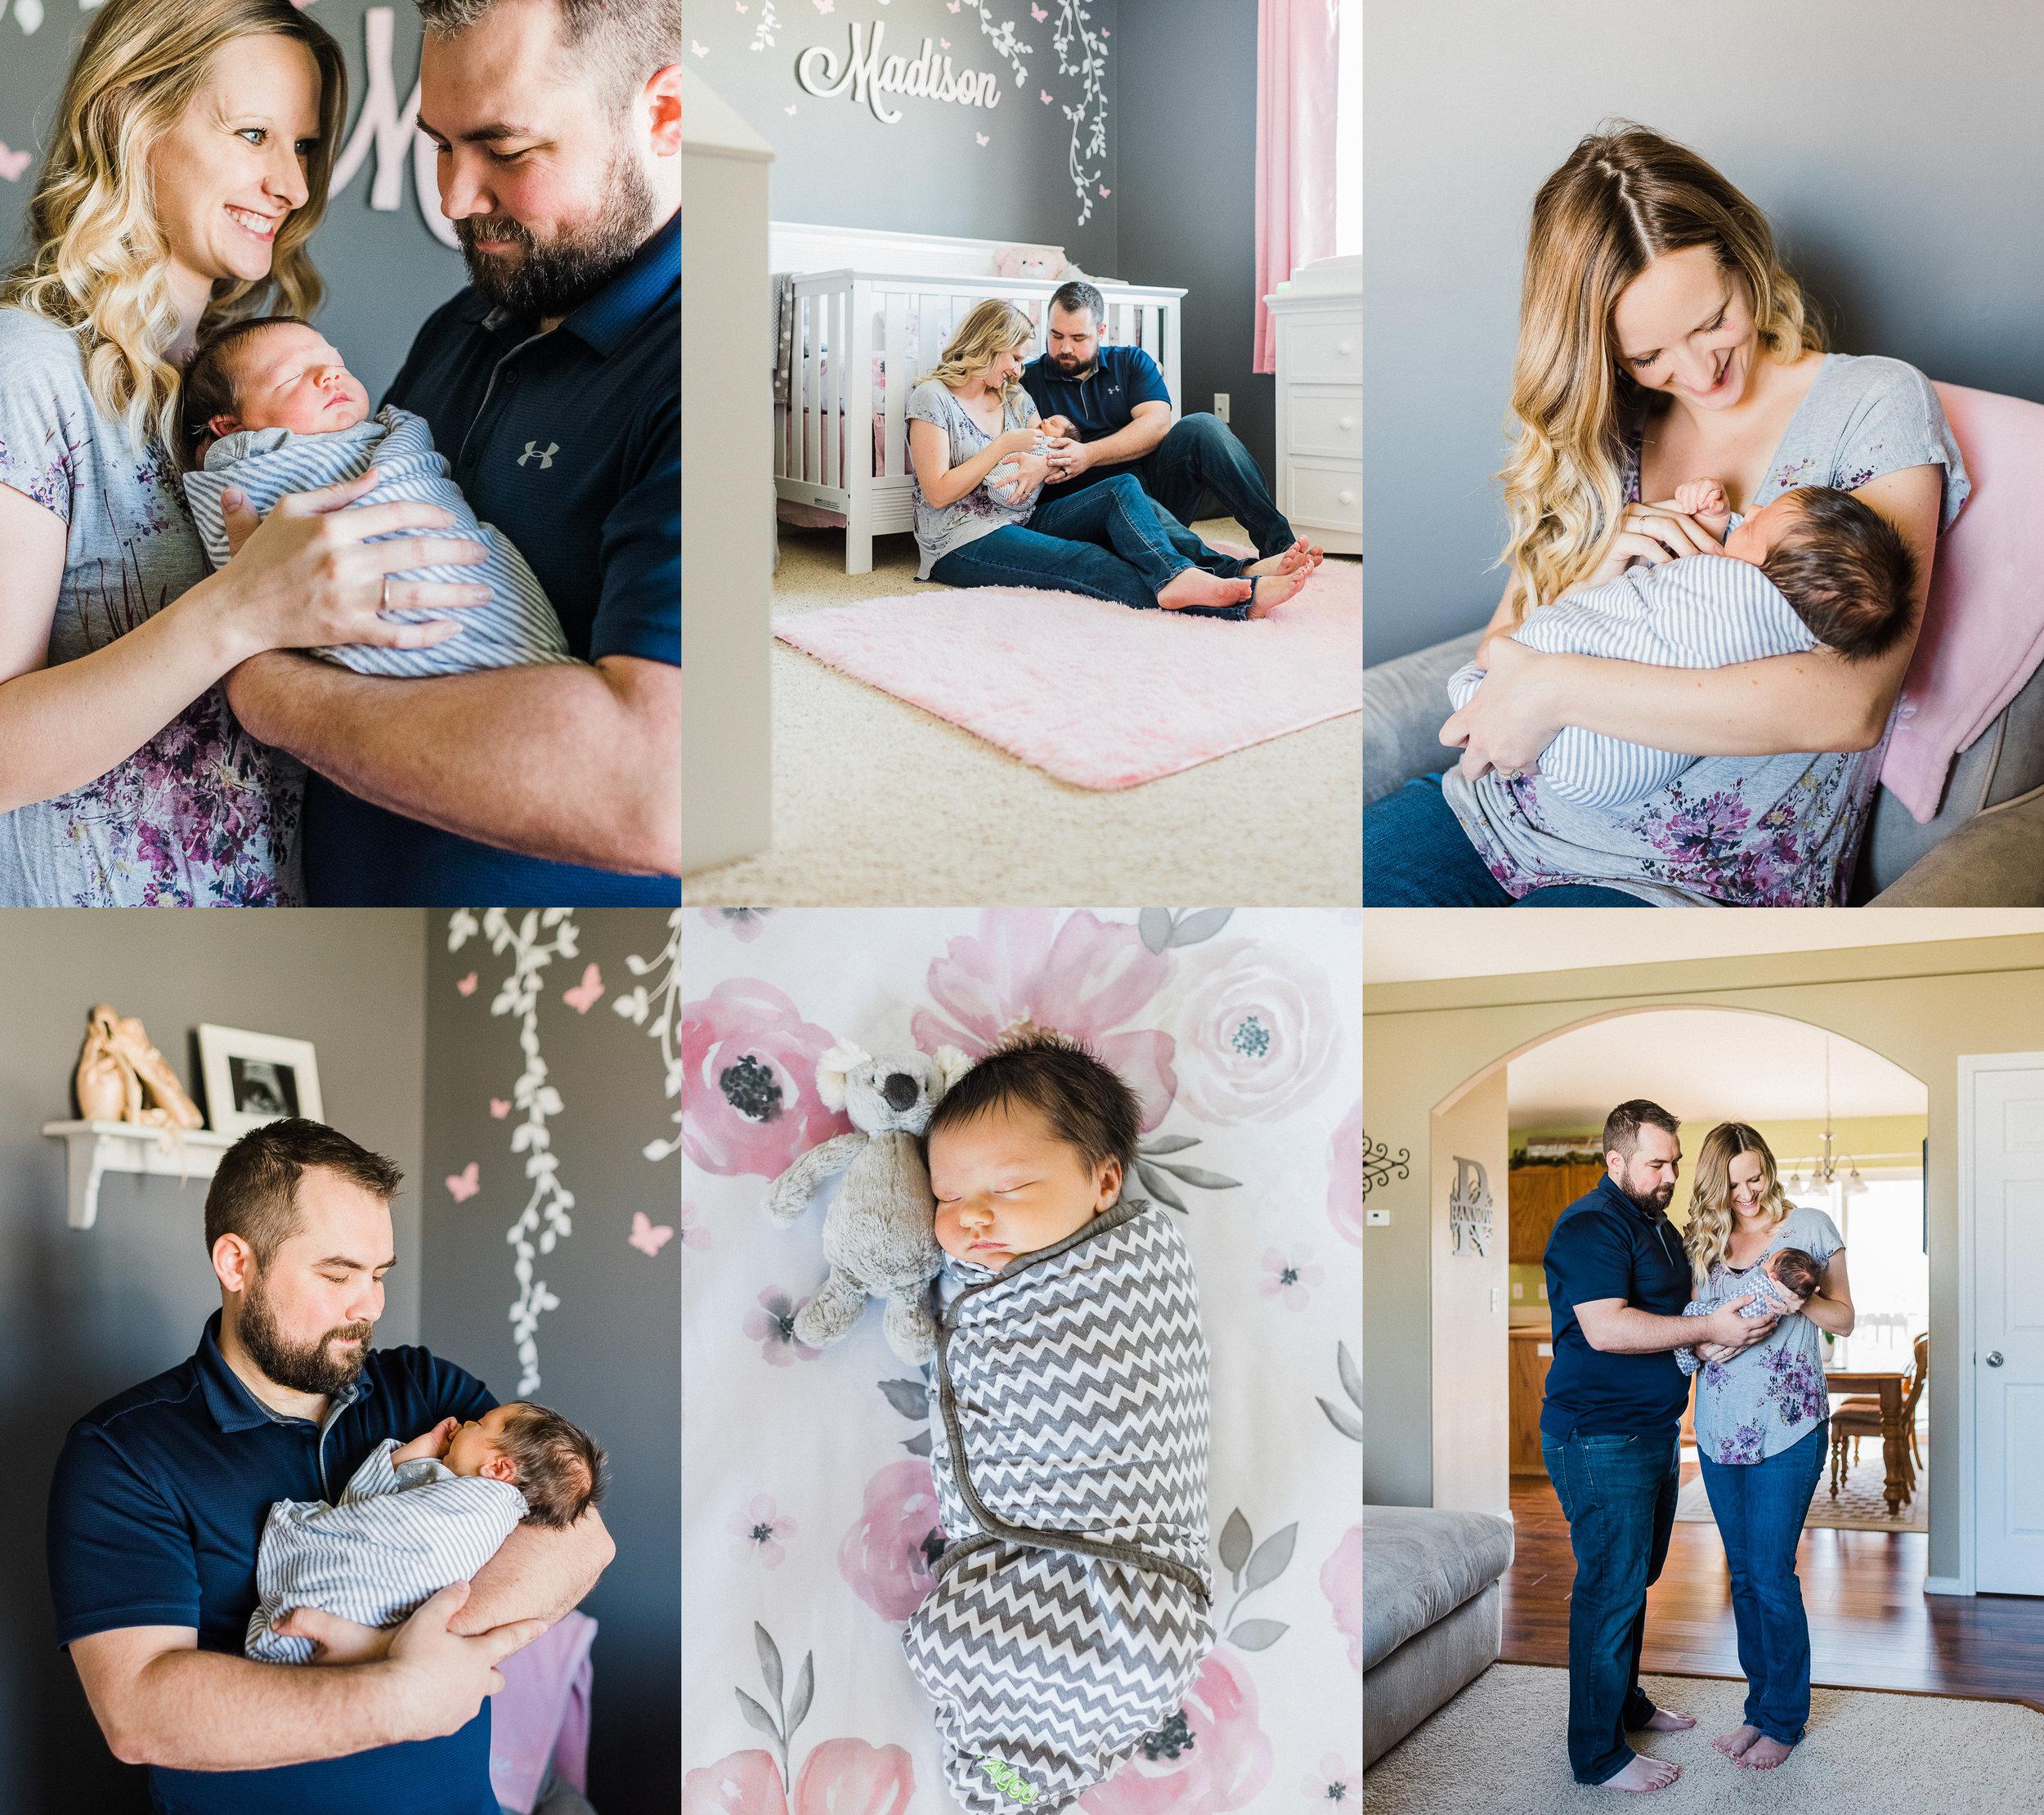 spokane_newborn_session_at_home.jpg